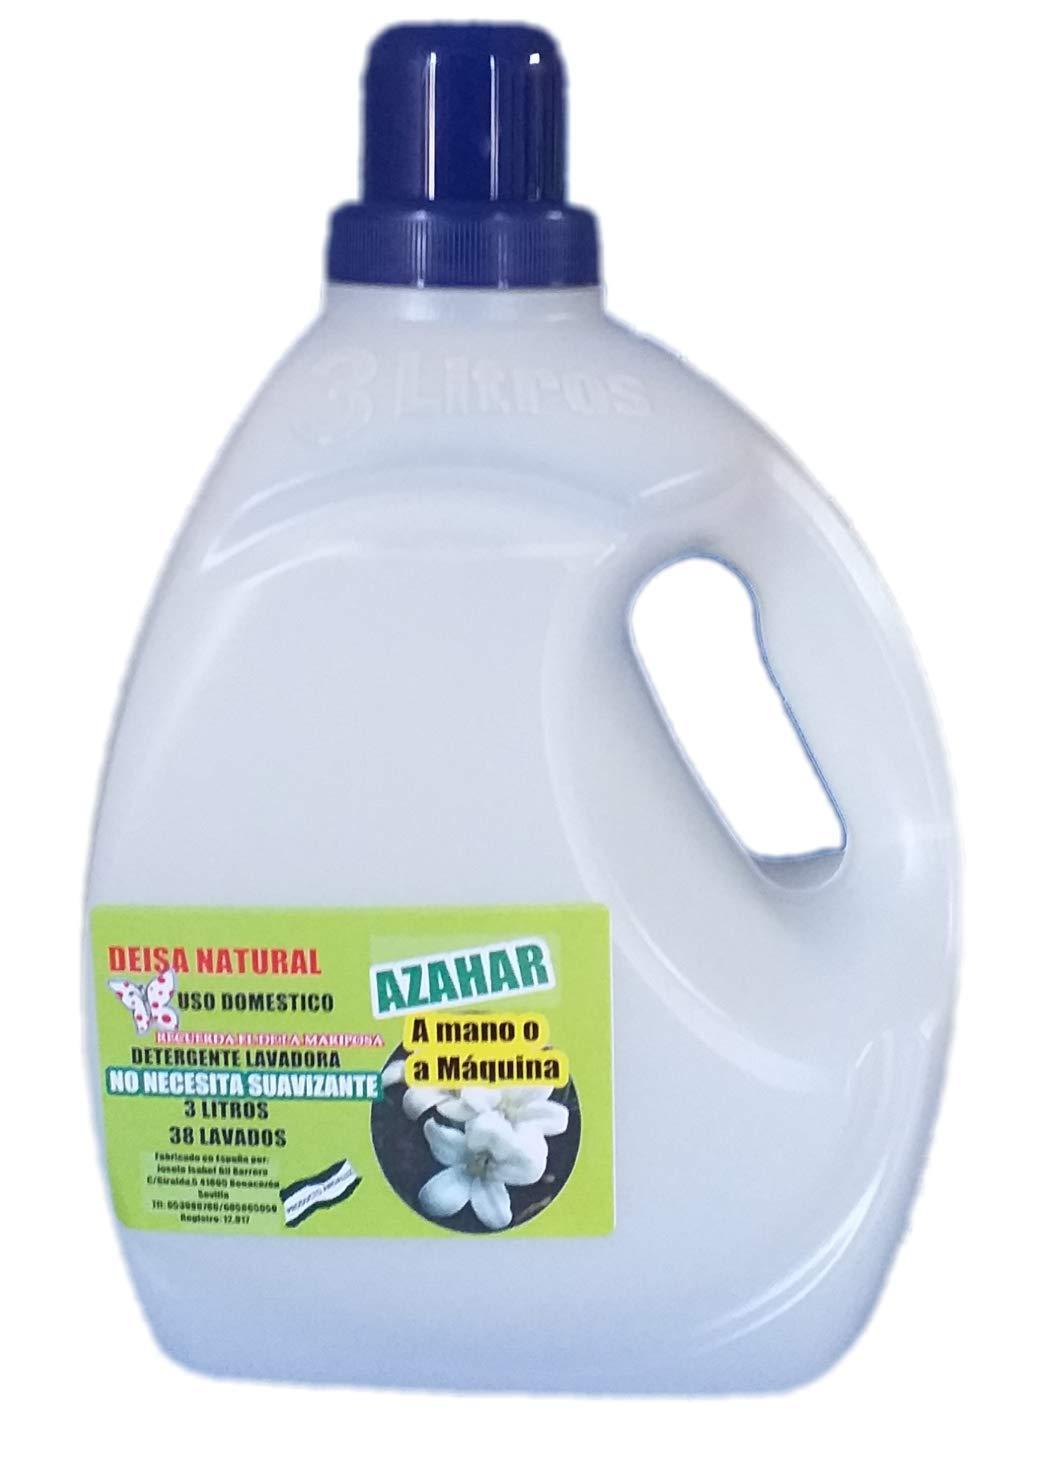 DEISA NATURAL DETERGENTE Natural Lavadora AZAHAR 3 litros. 38 ...